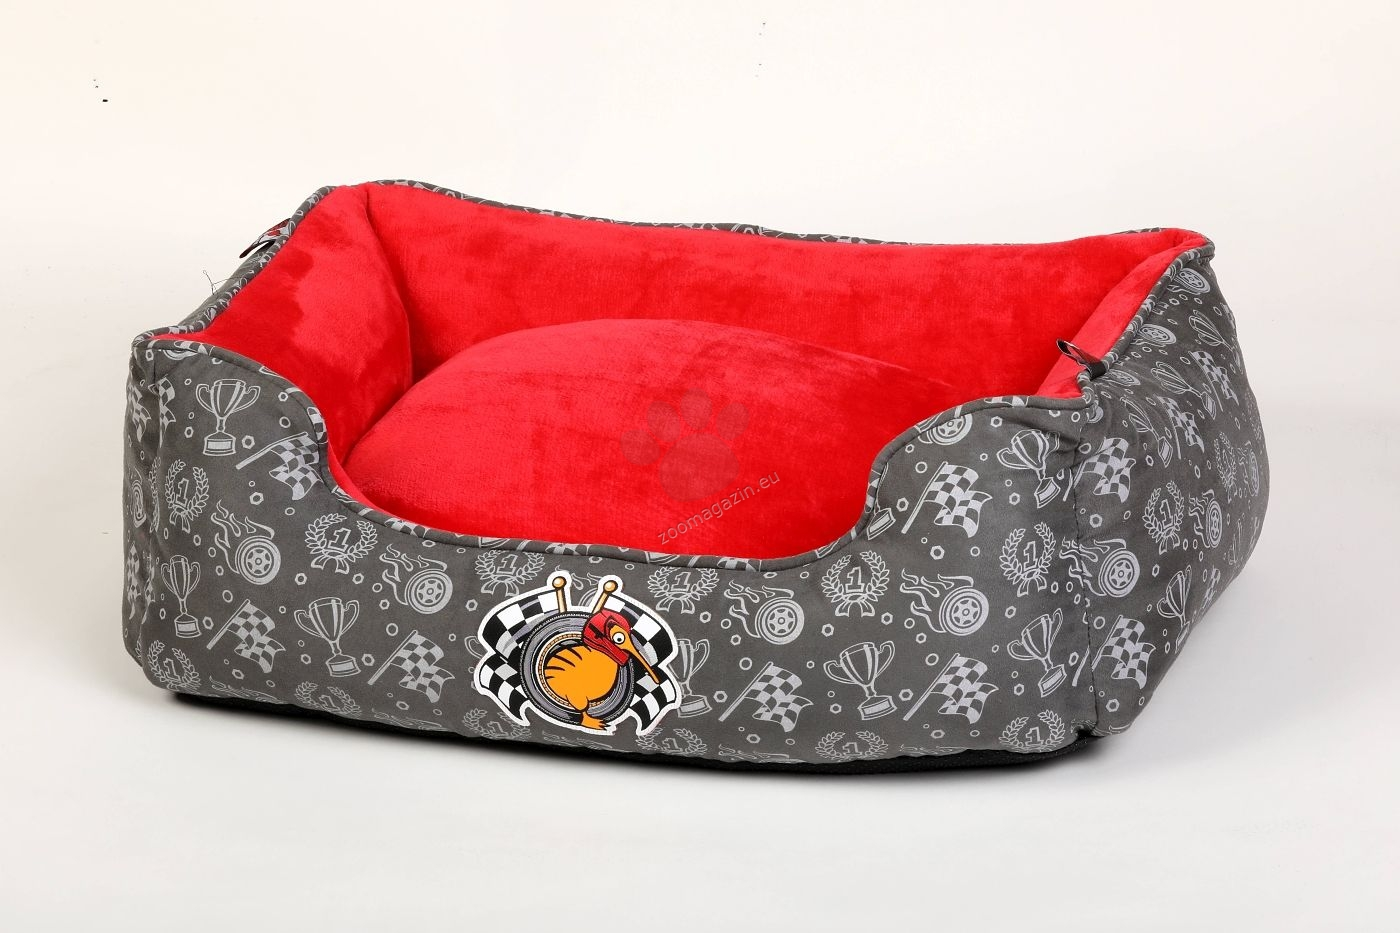 Kiwi Walker Bed Border Racer/Sailor M - ортопедично легло с мемори пяна 65 / 45 / 22 см. / червен, син /